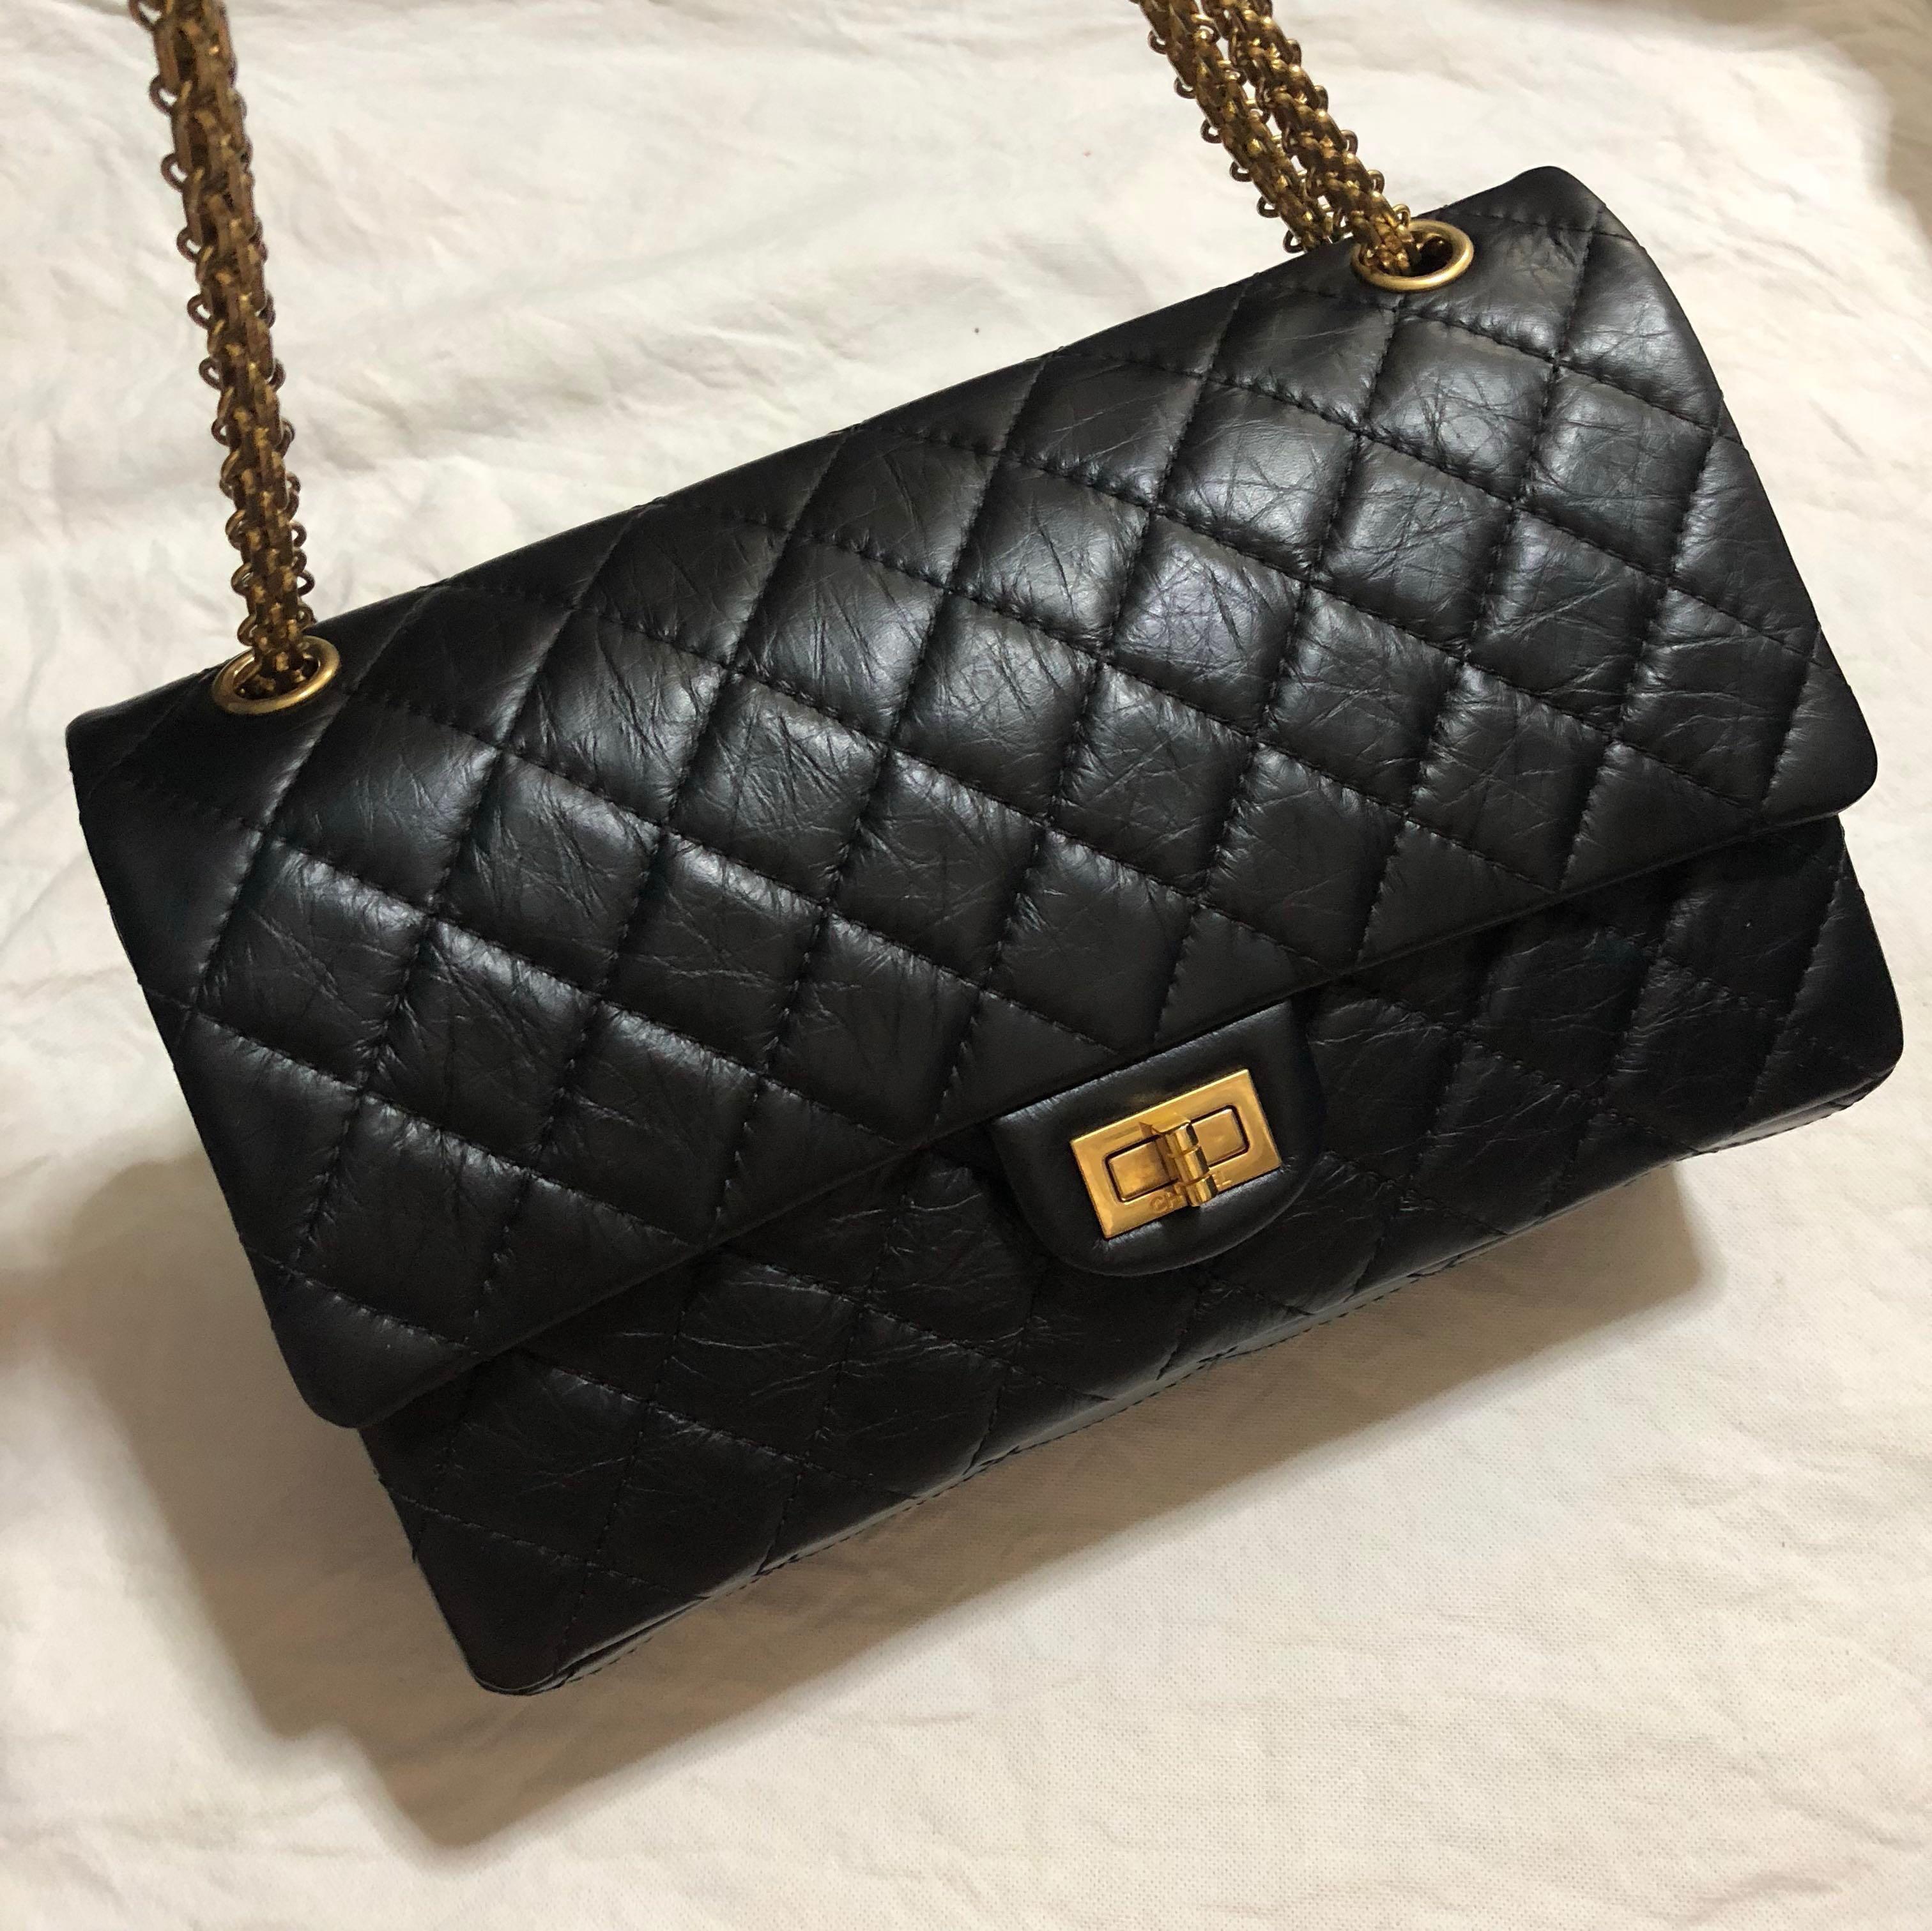 eafa800dca4b04 Chanel Reissue Medium Large 226 Quilted Flap Bag Black Gold Hardware